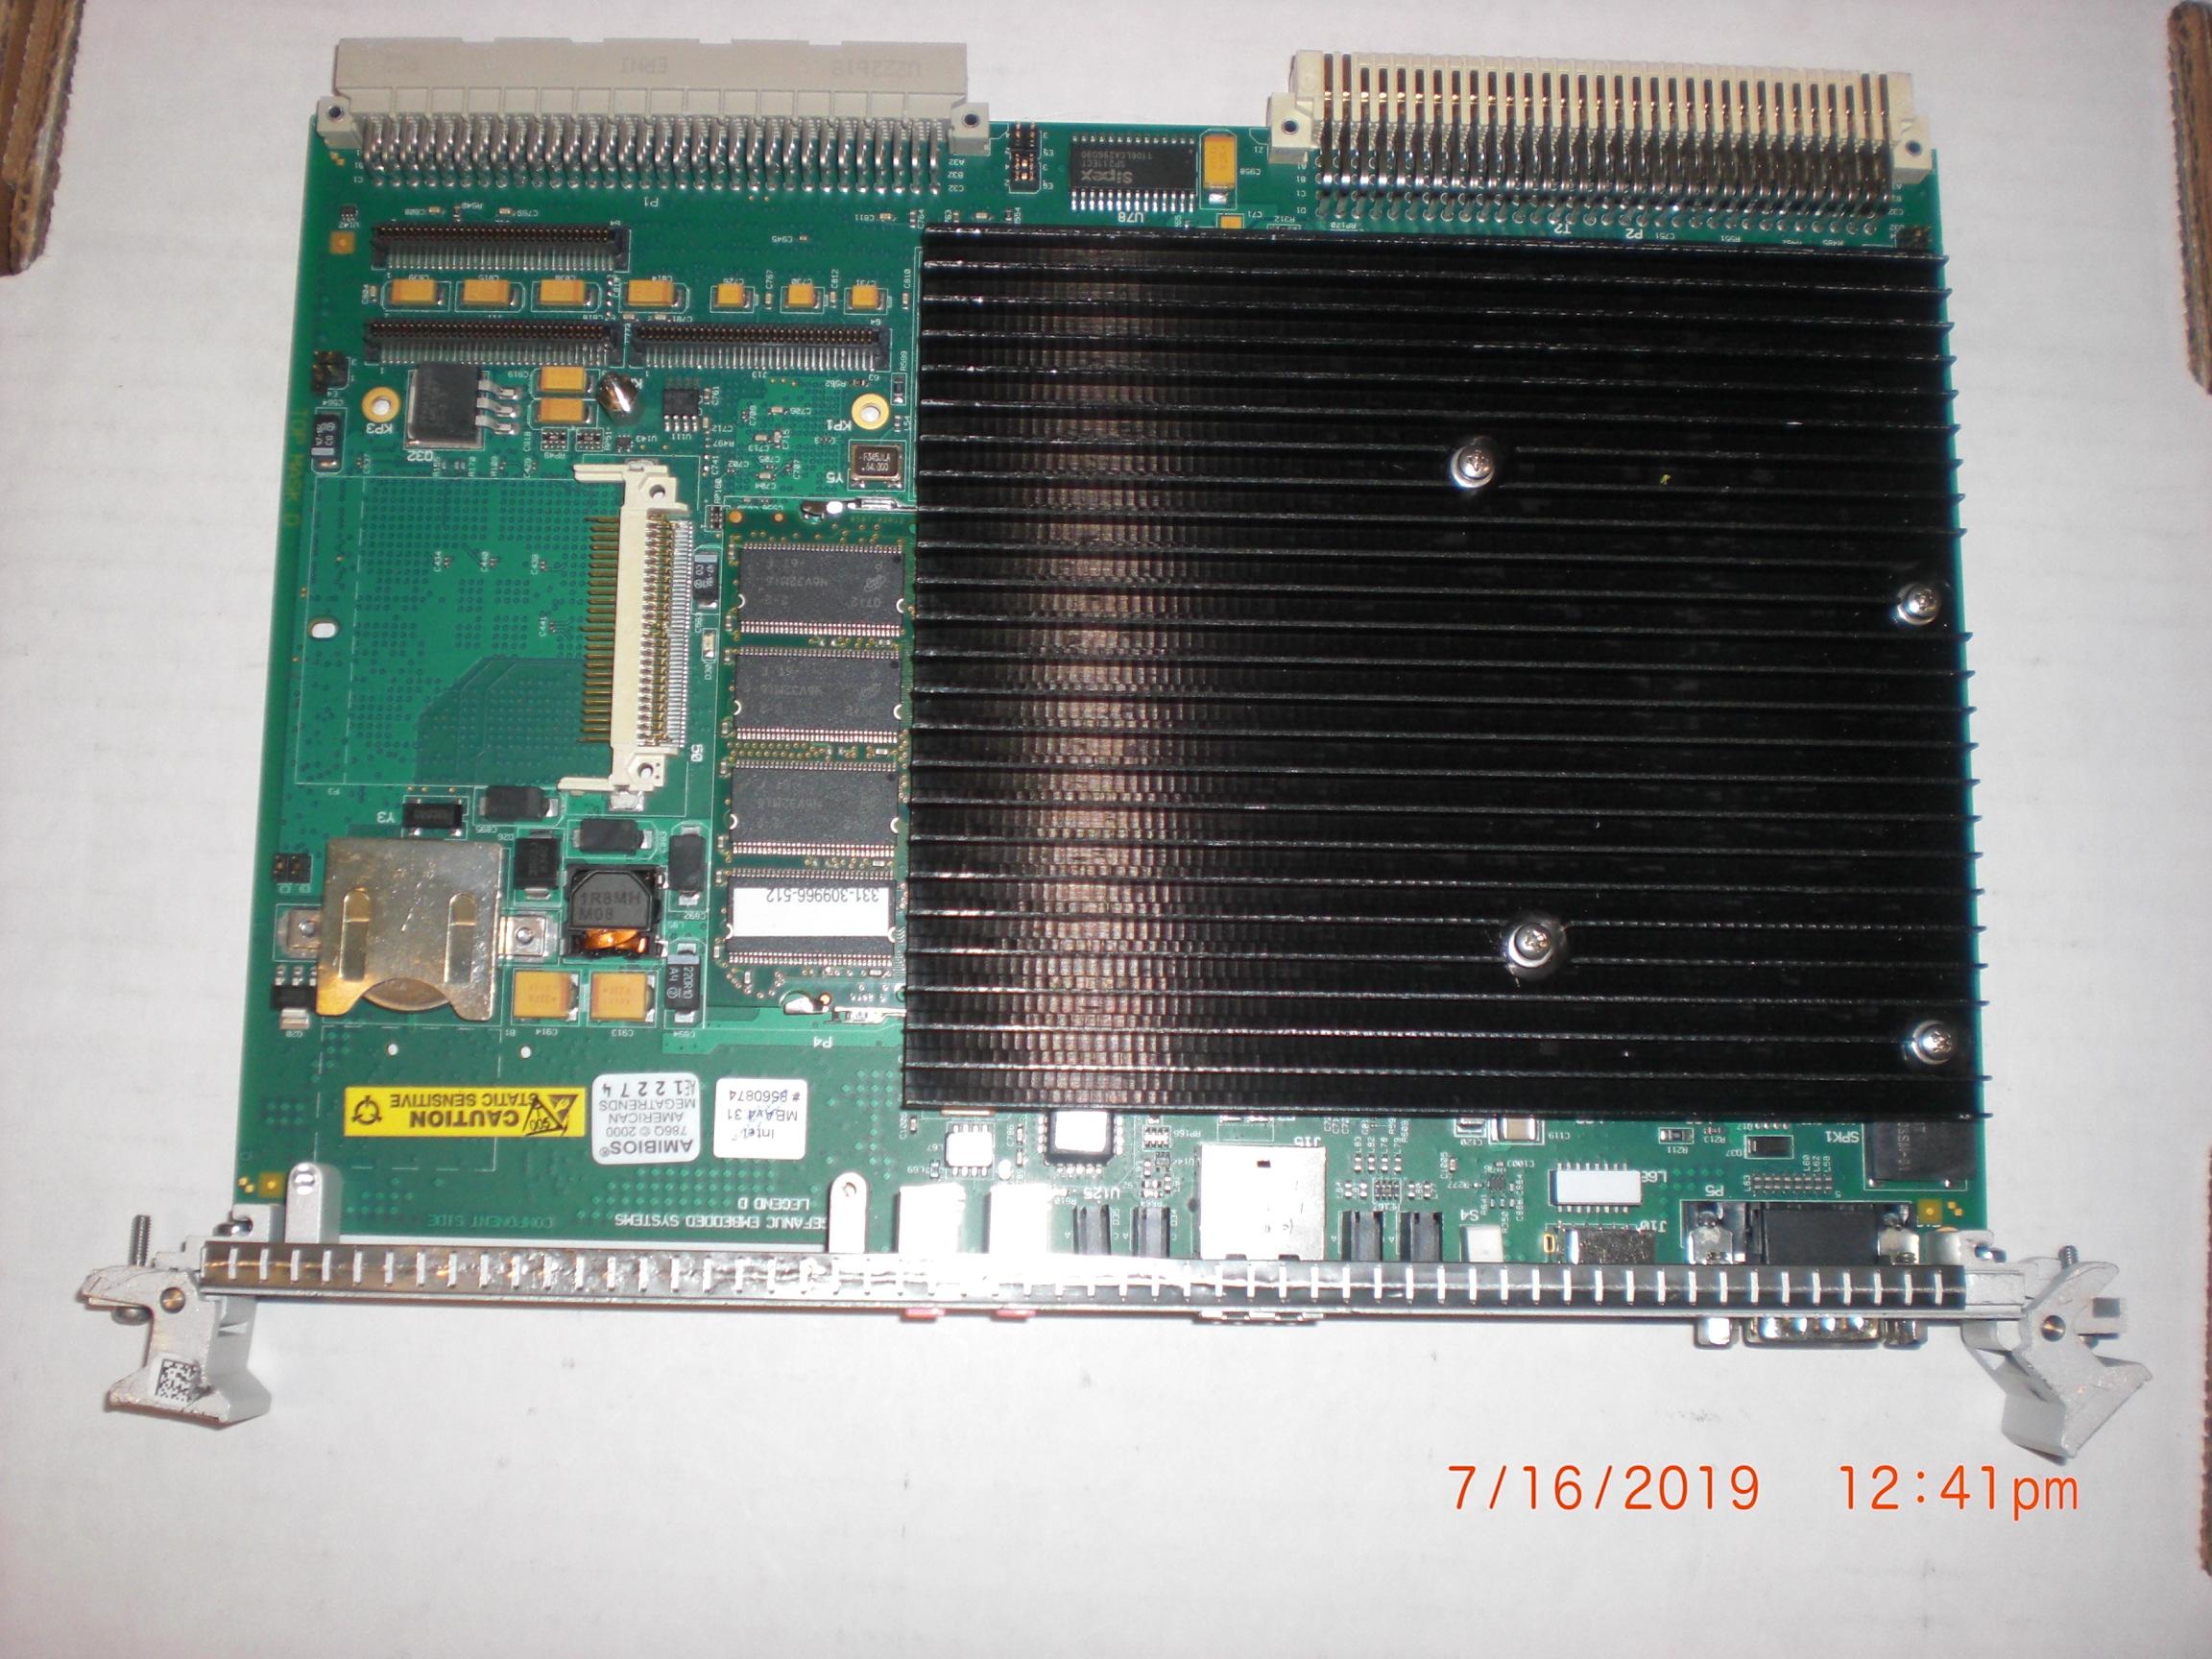 PCB GE FANUC VMiVME 7645 Applied Materials (AMAT) 0190-15949 NO RETURNS